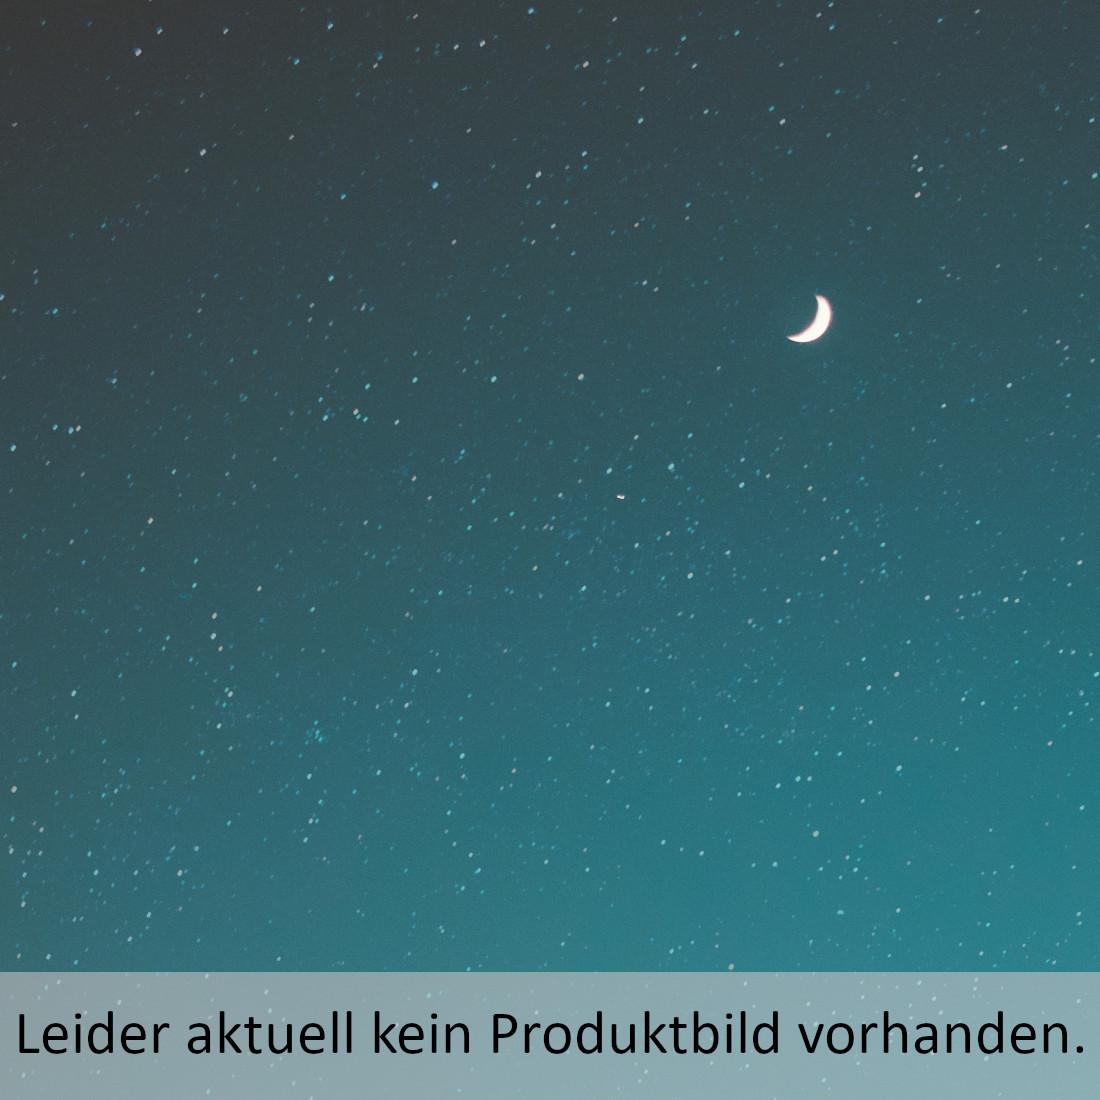 Neukirchener Kalender 2019 - Buchausgabe kartoniert